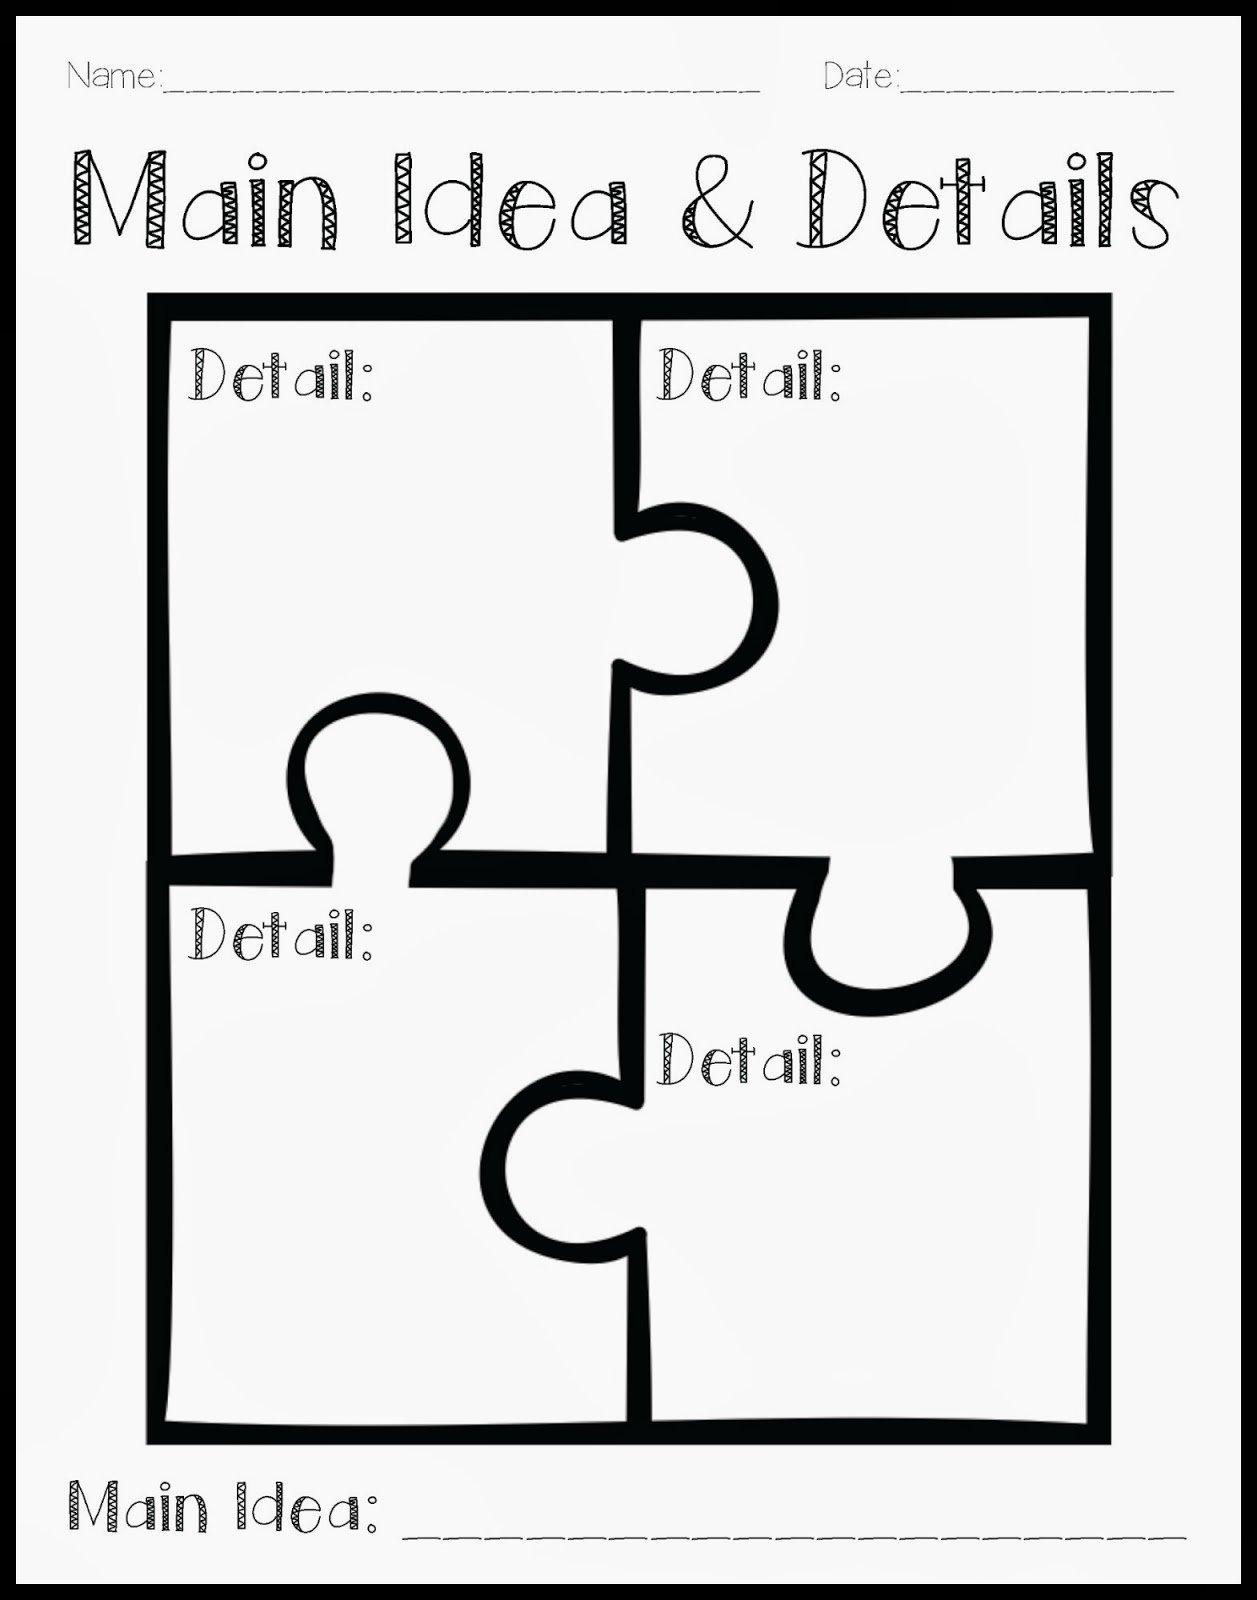 10 Wonderful Main Idea Graphic Organizer Printable